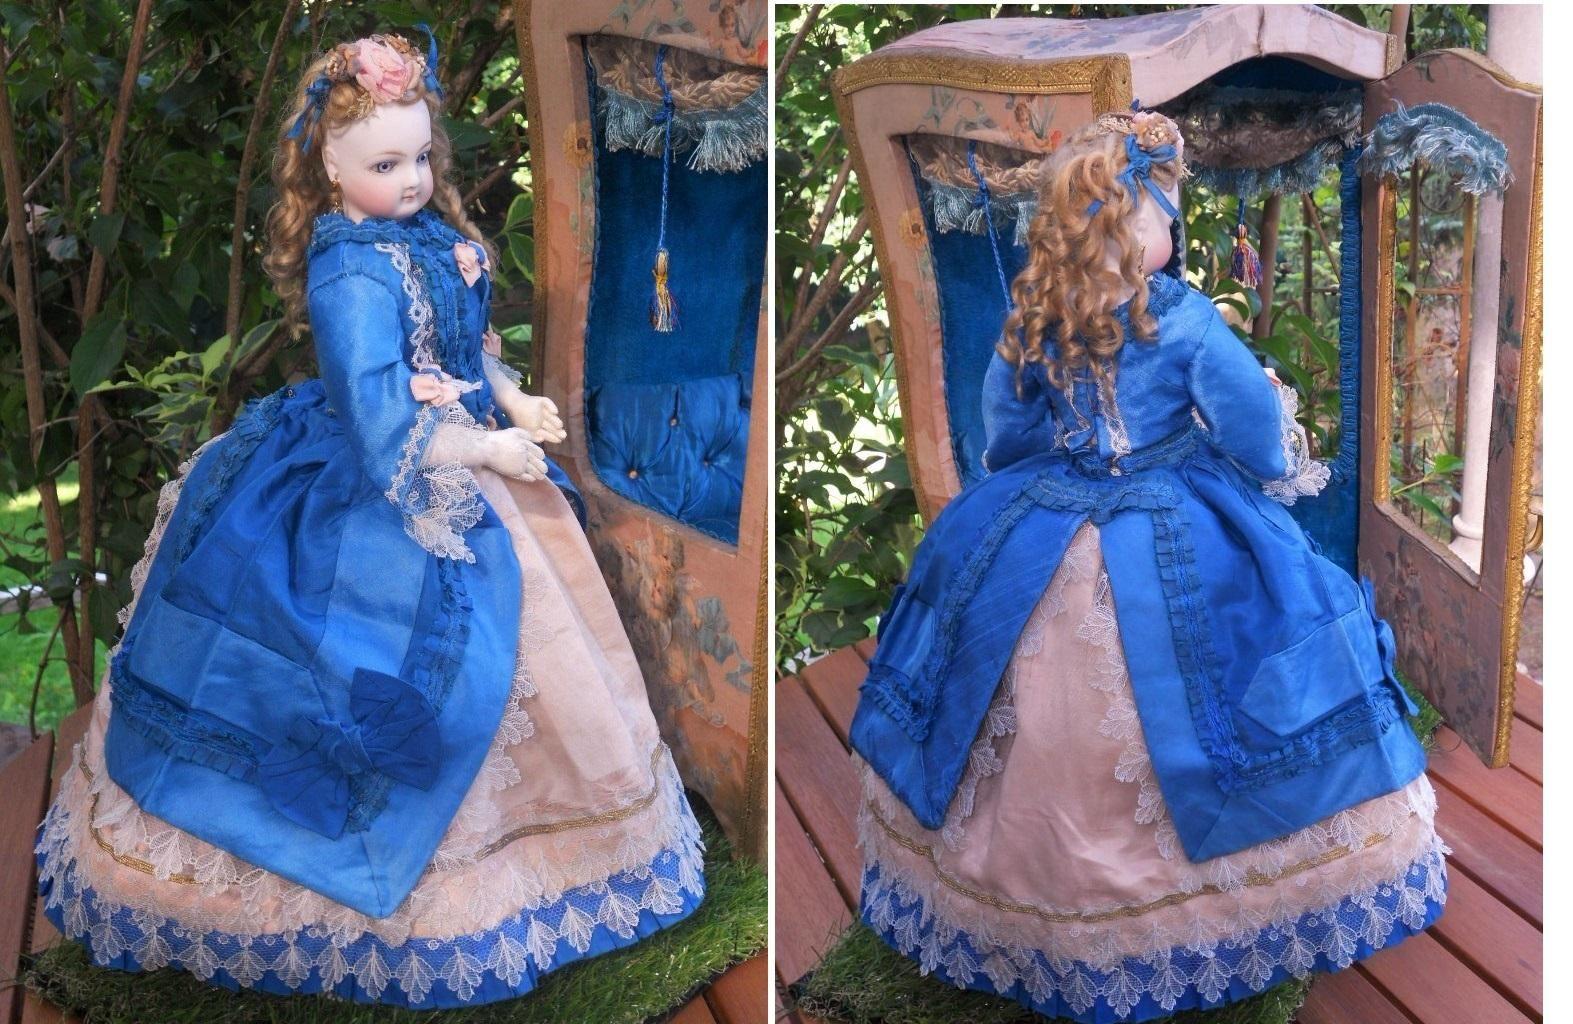 ~~~ Breathtaking All-Original French Poupee in Her Original Cabinet ~~~